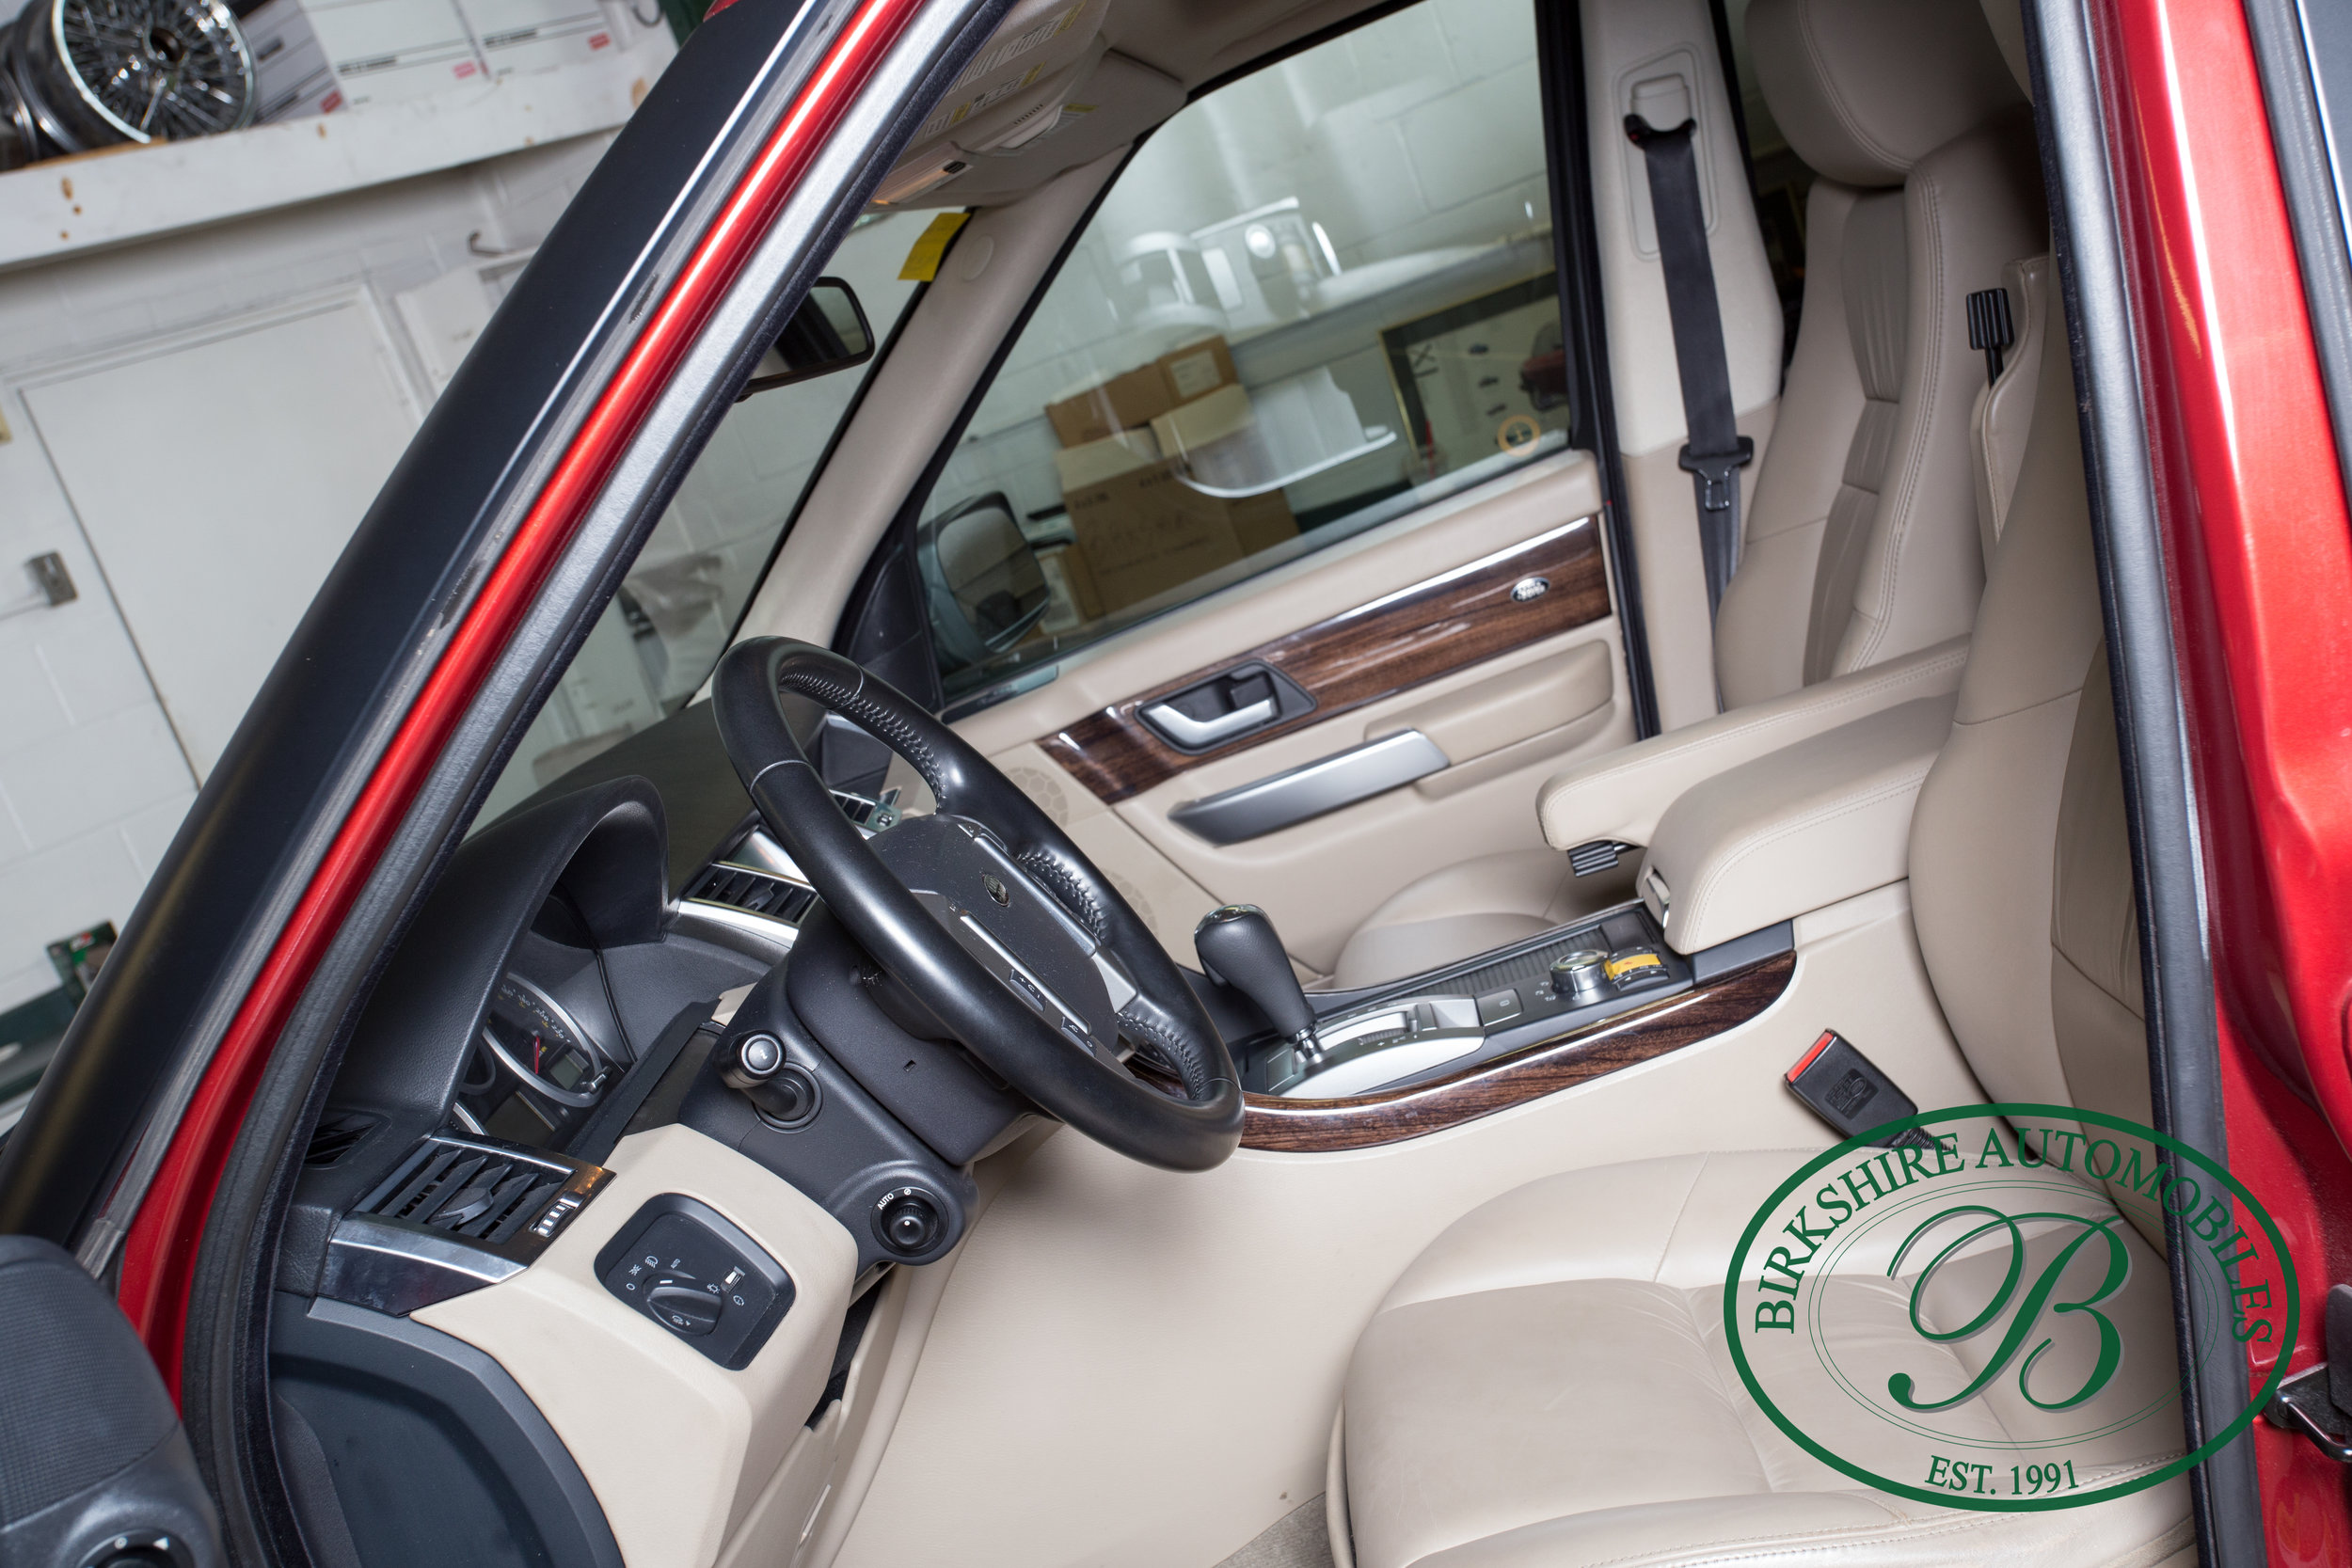 Birkshire Automobiles 2009 Range Rover Burgundy-92.jpg